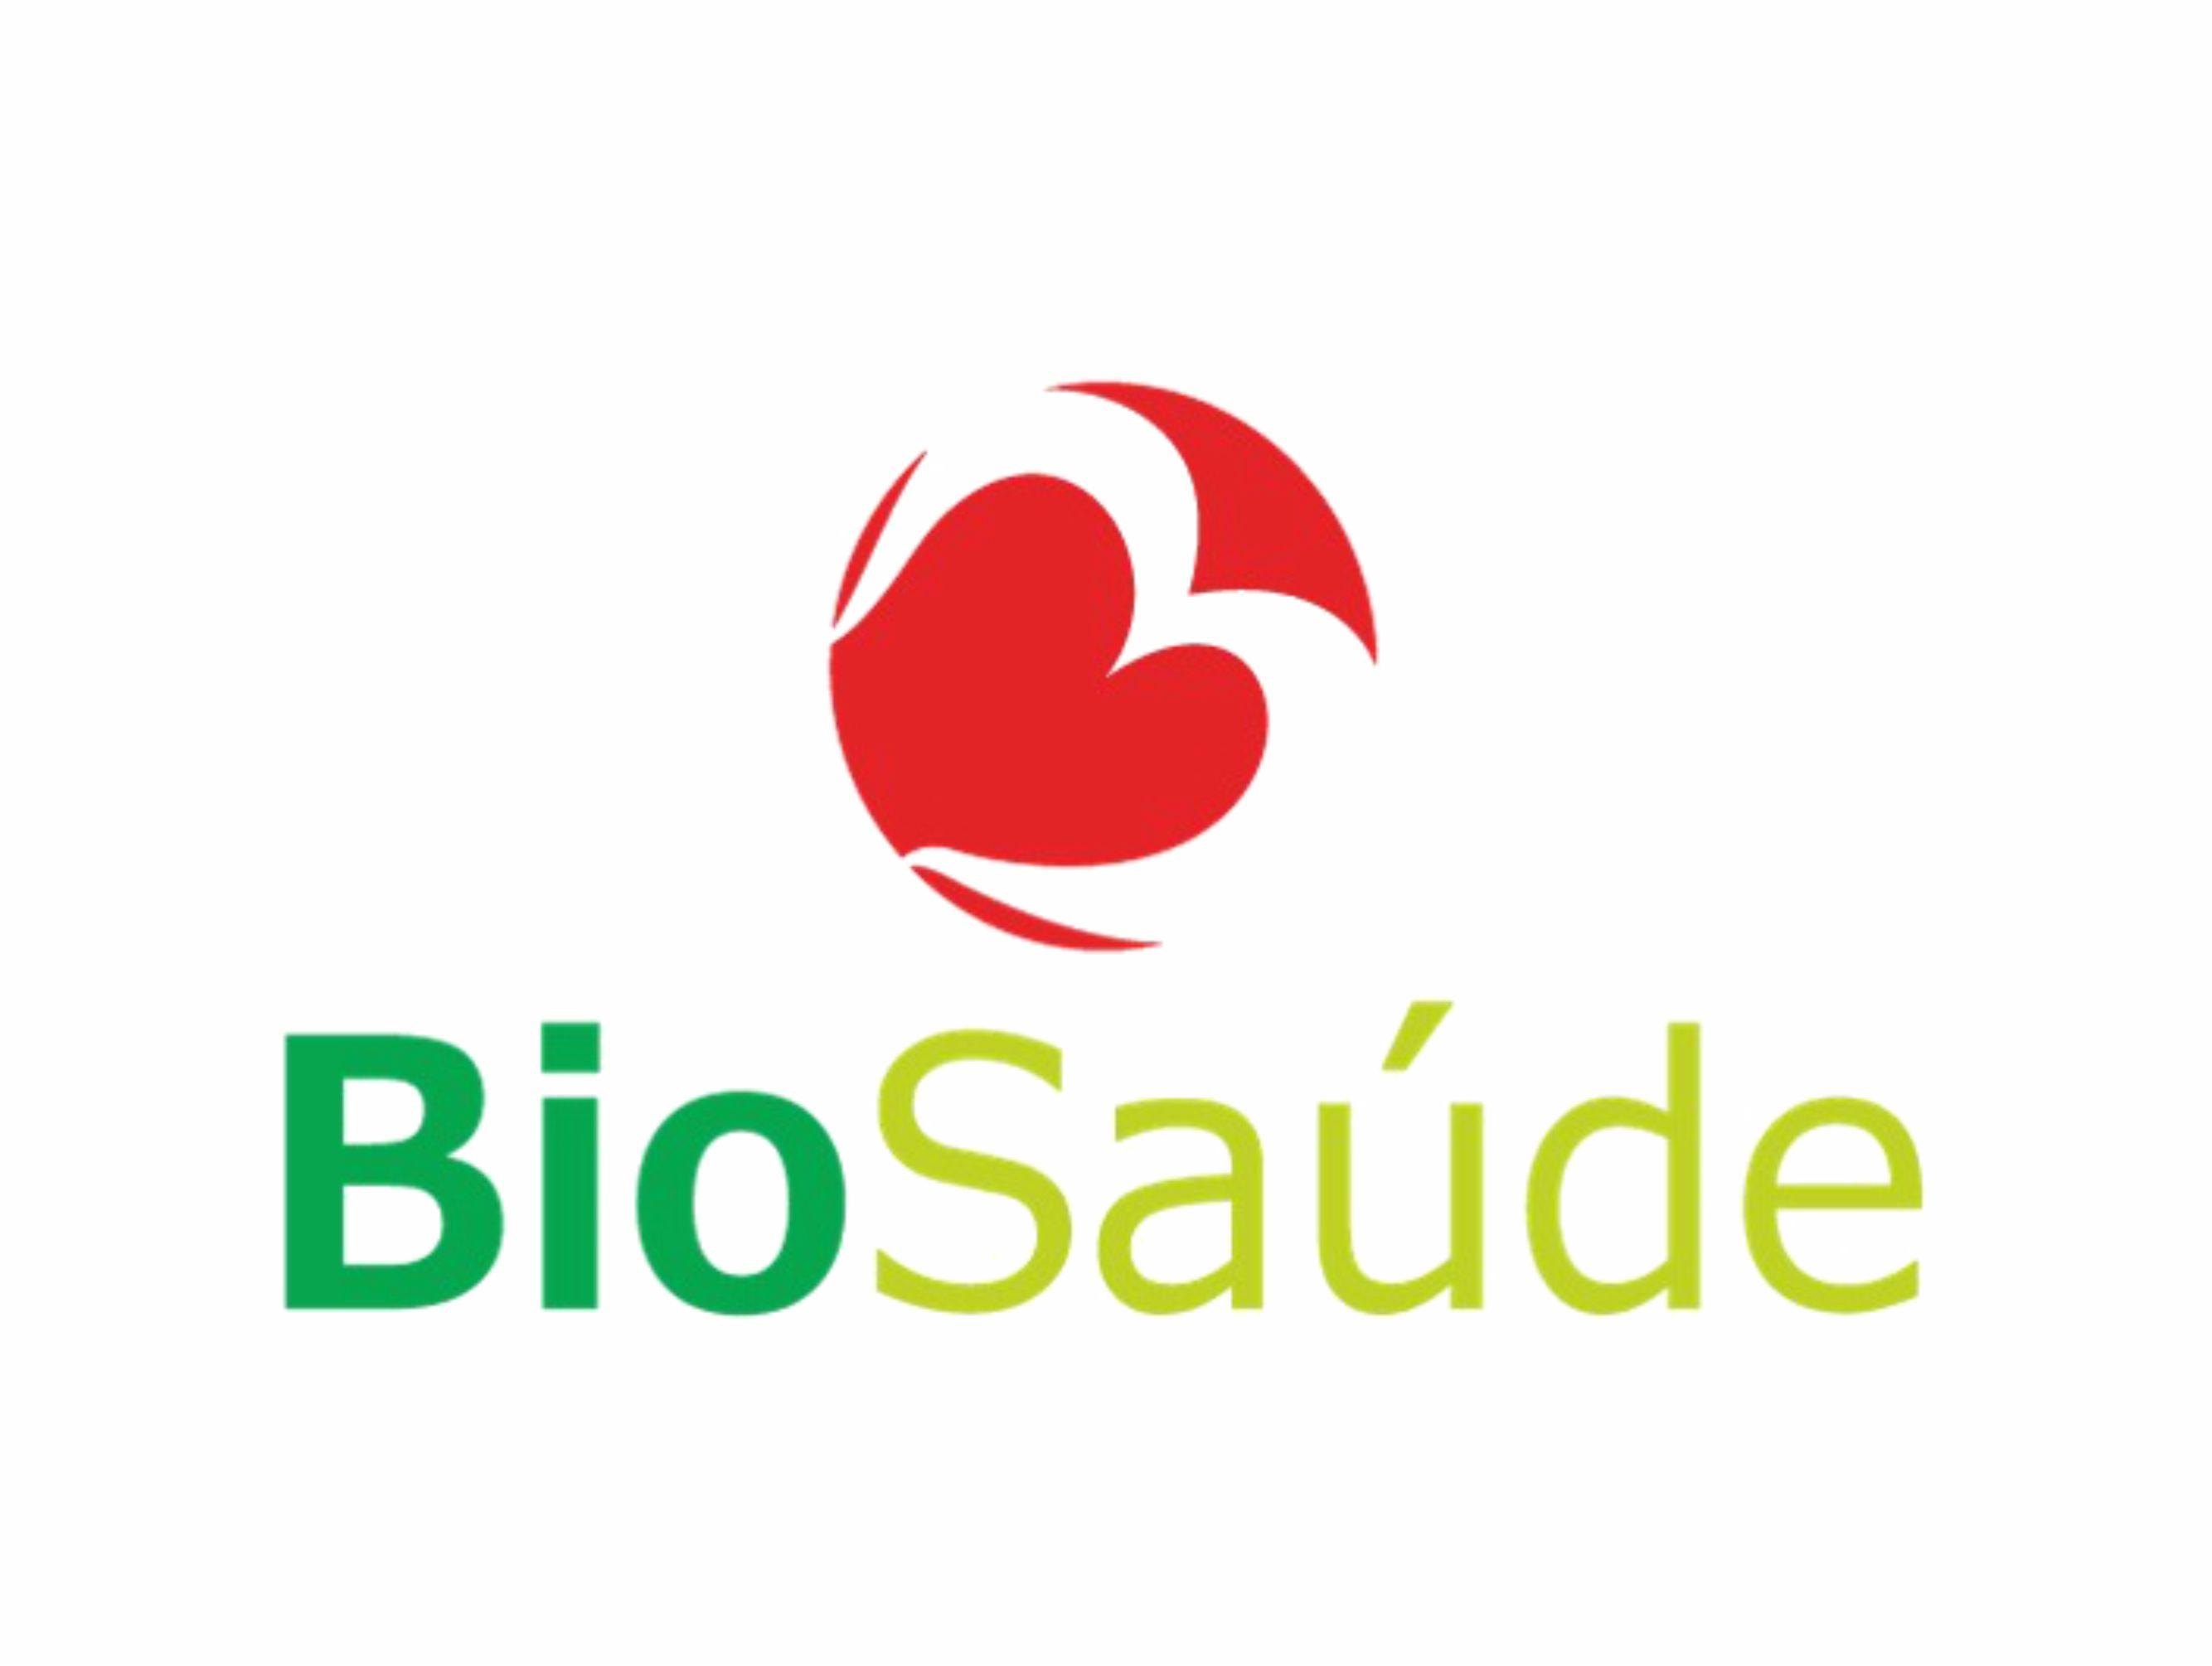 BioSaúde